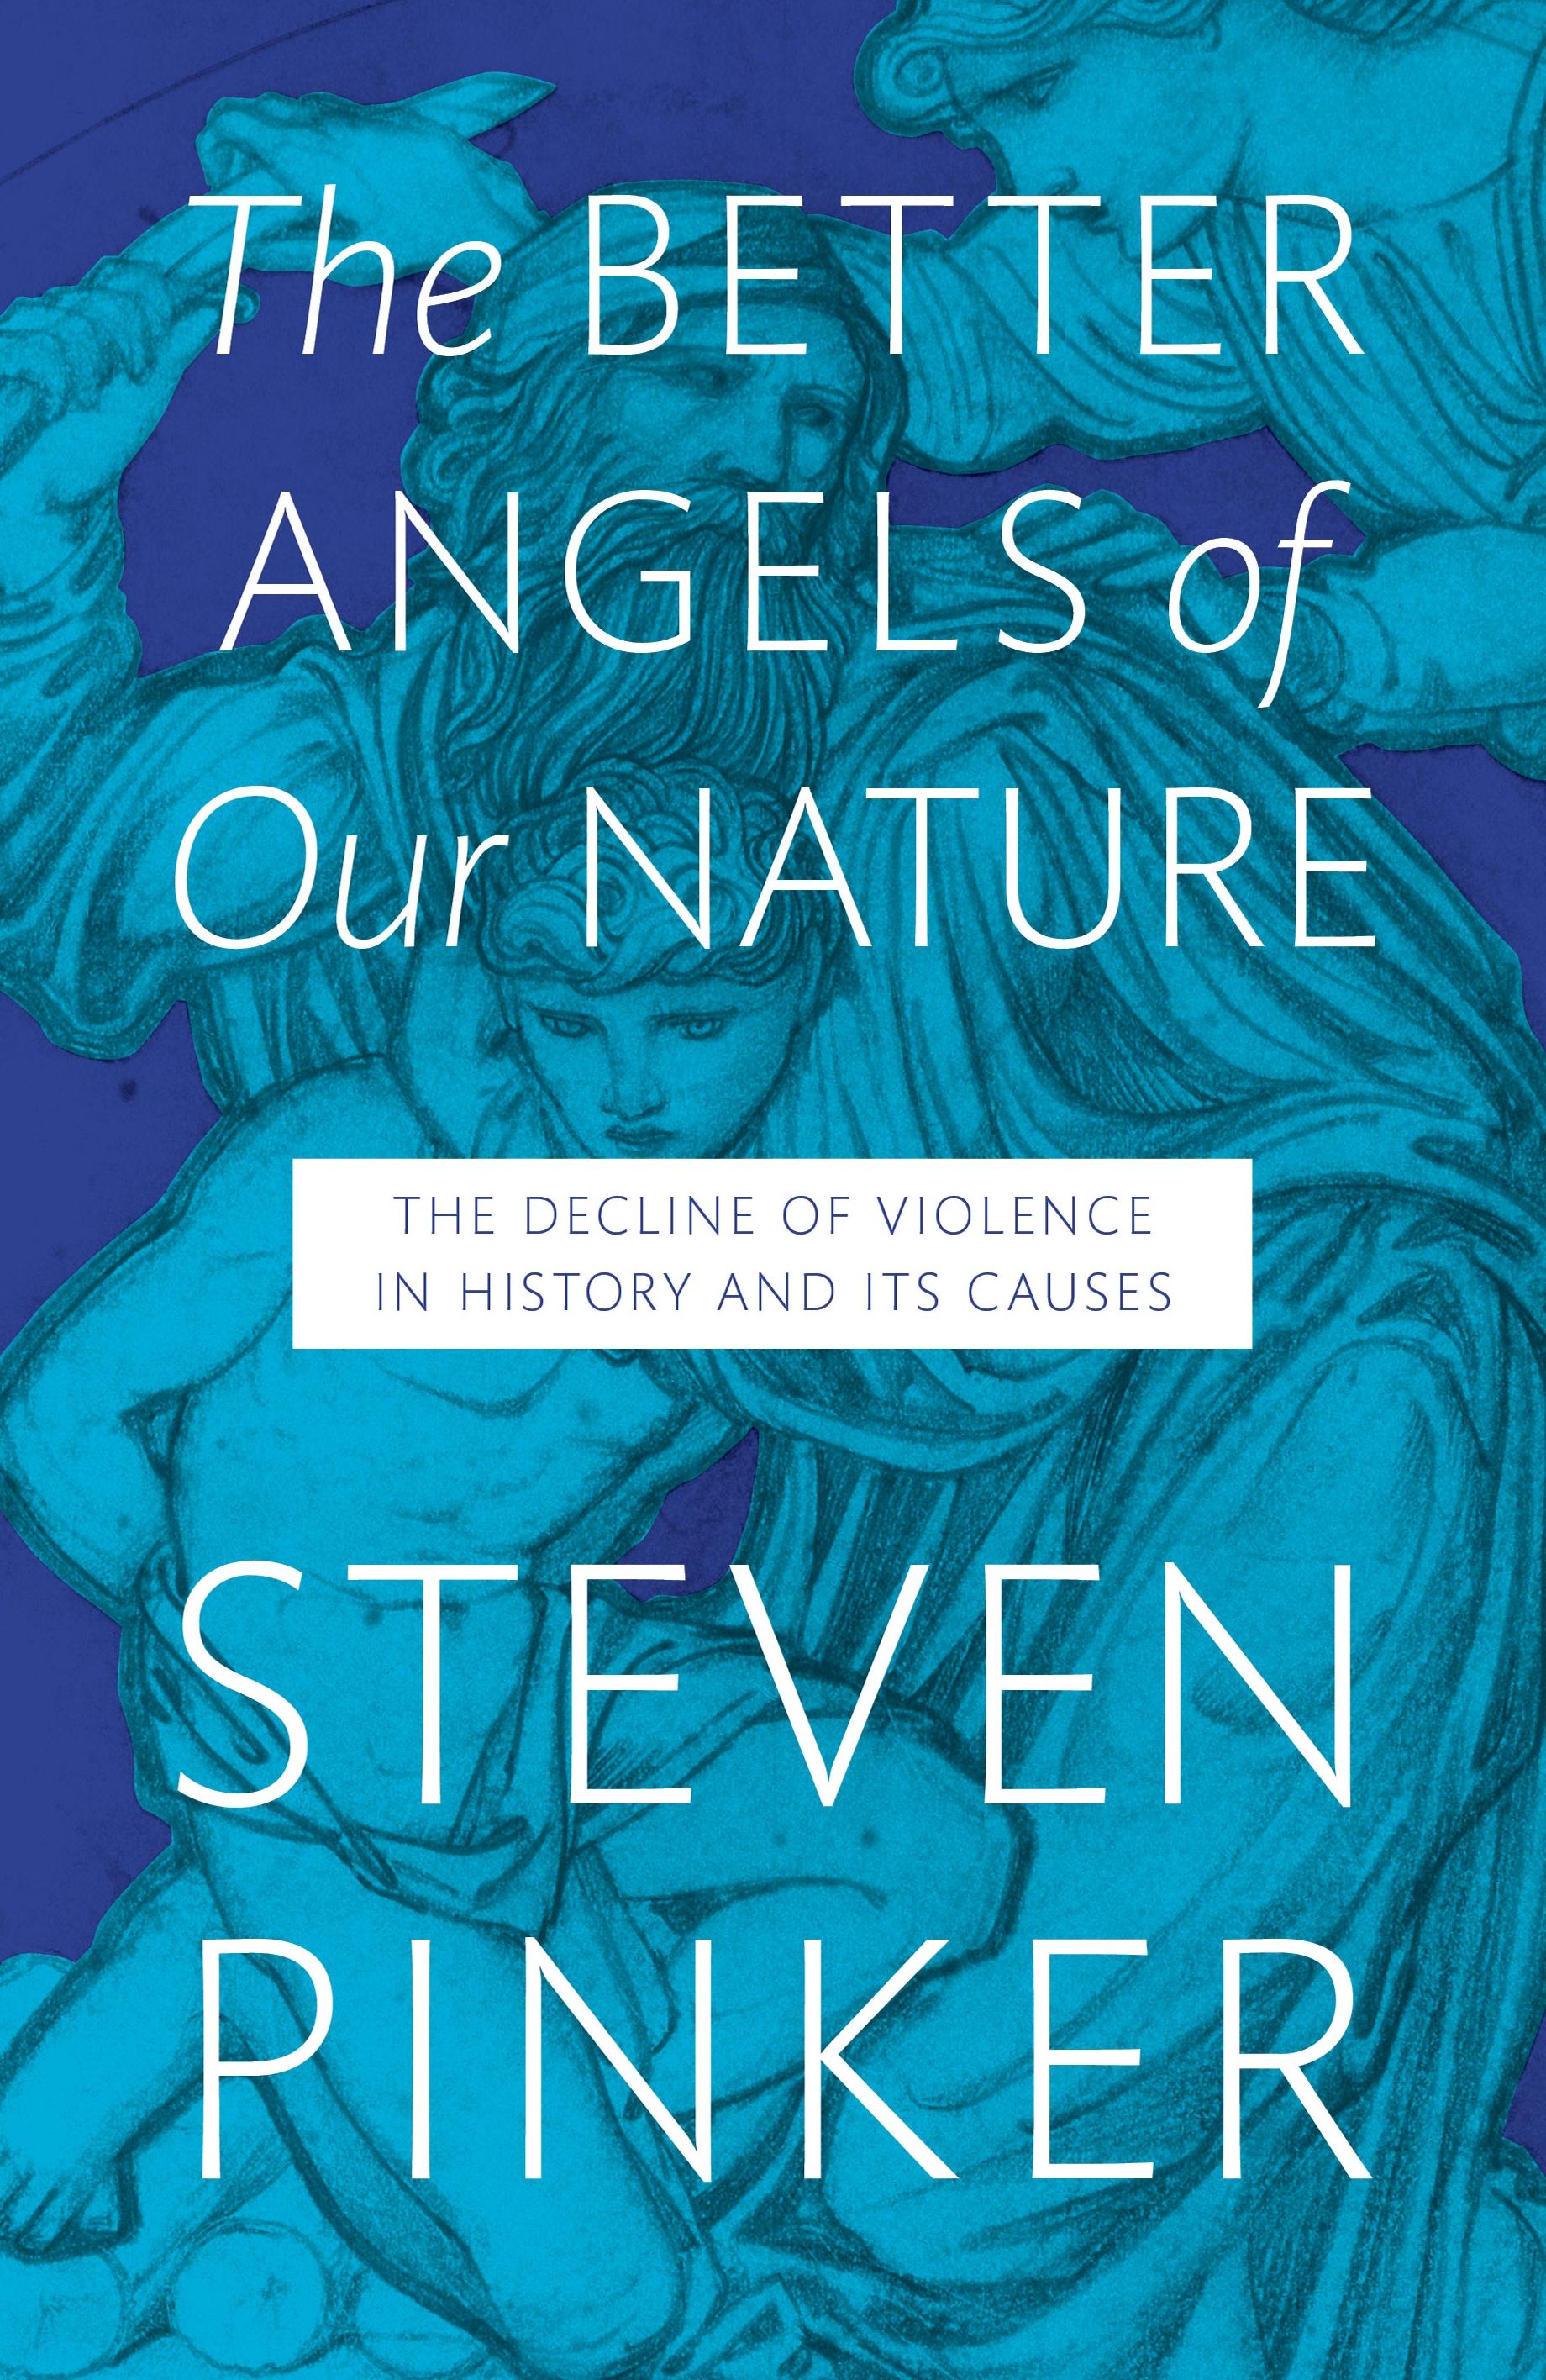 Better-angels-book-cover.jpg